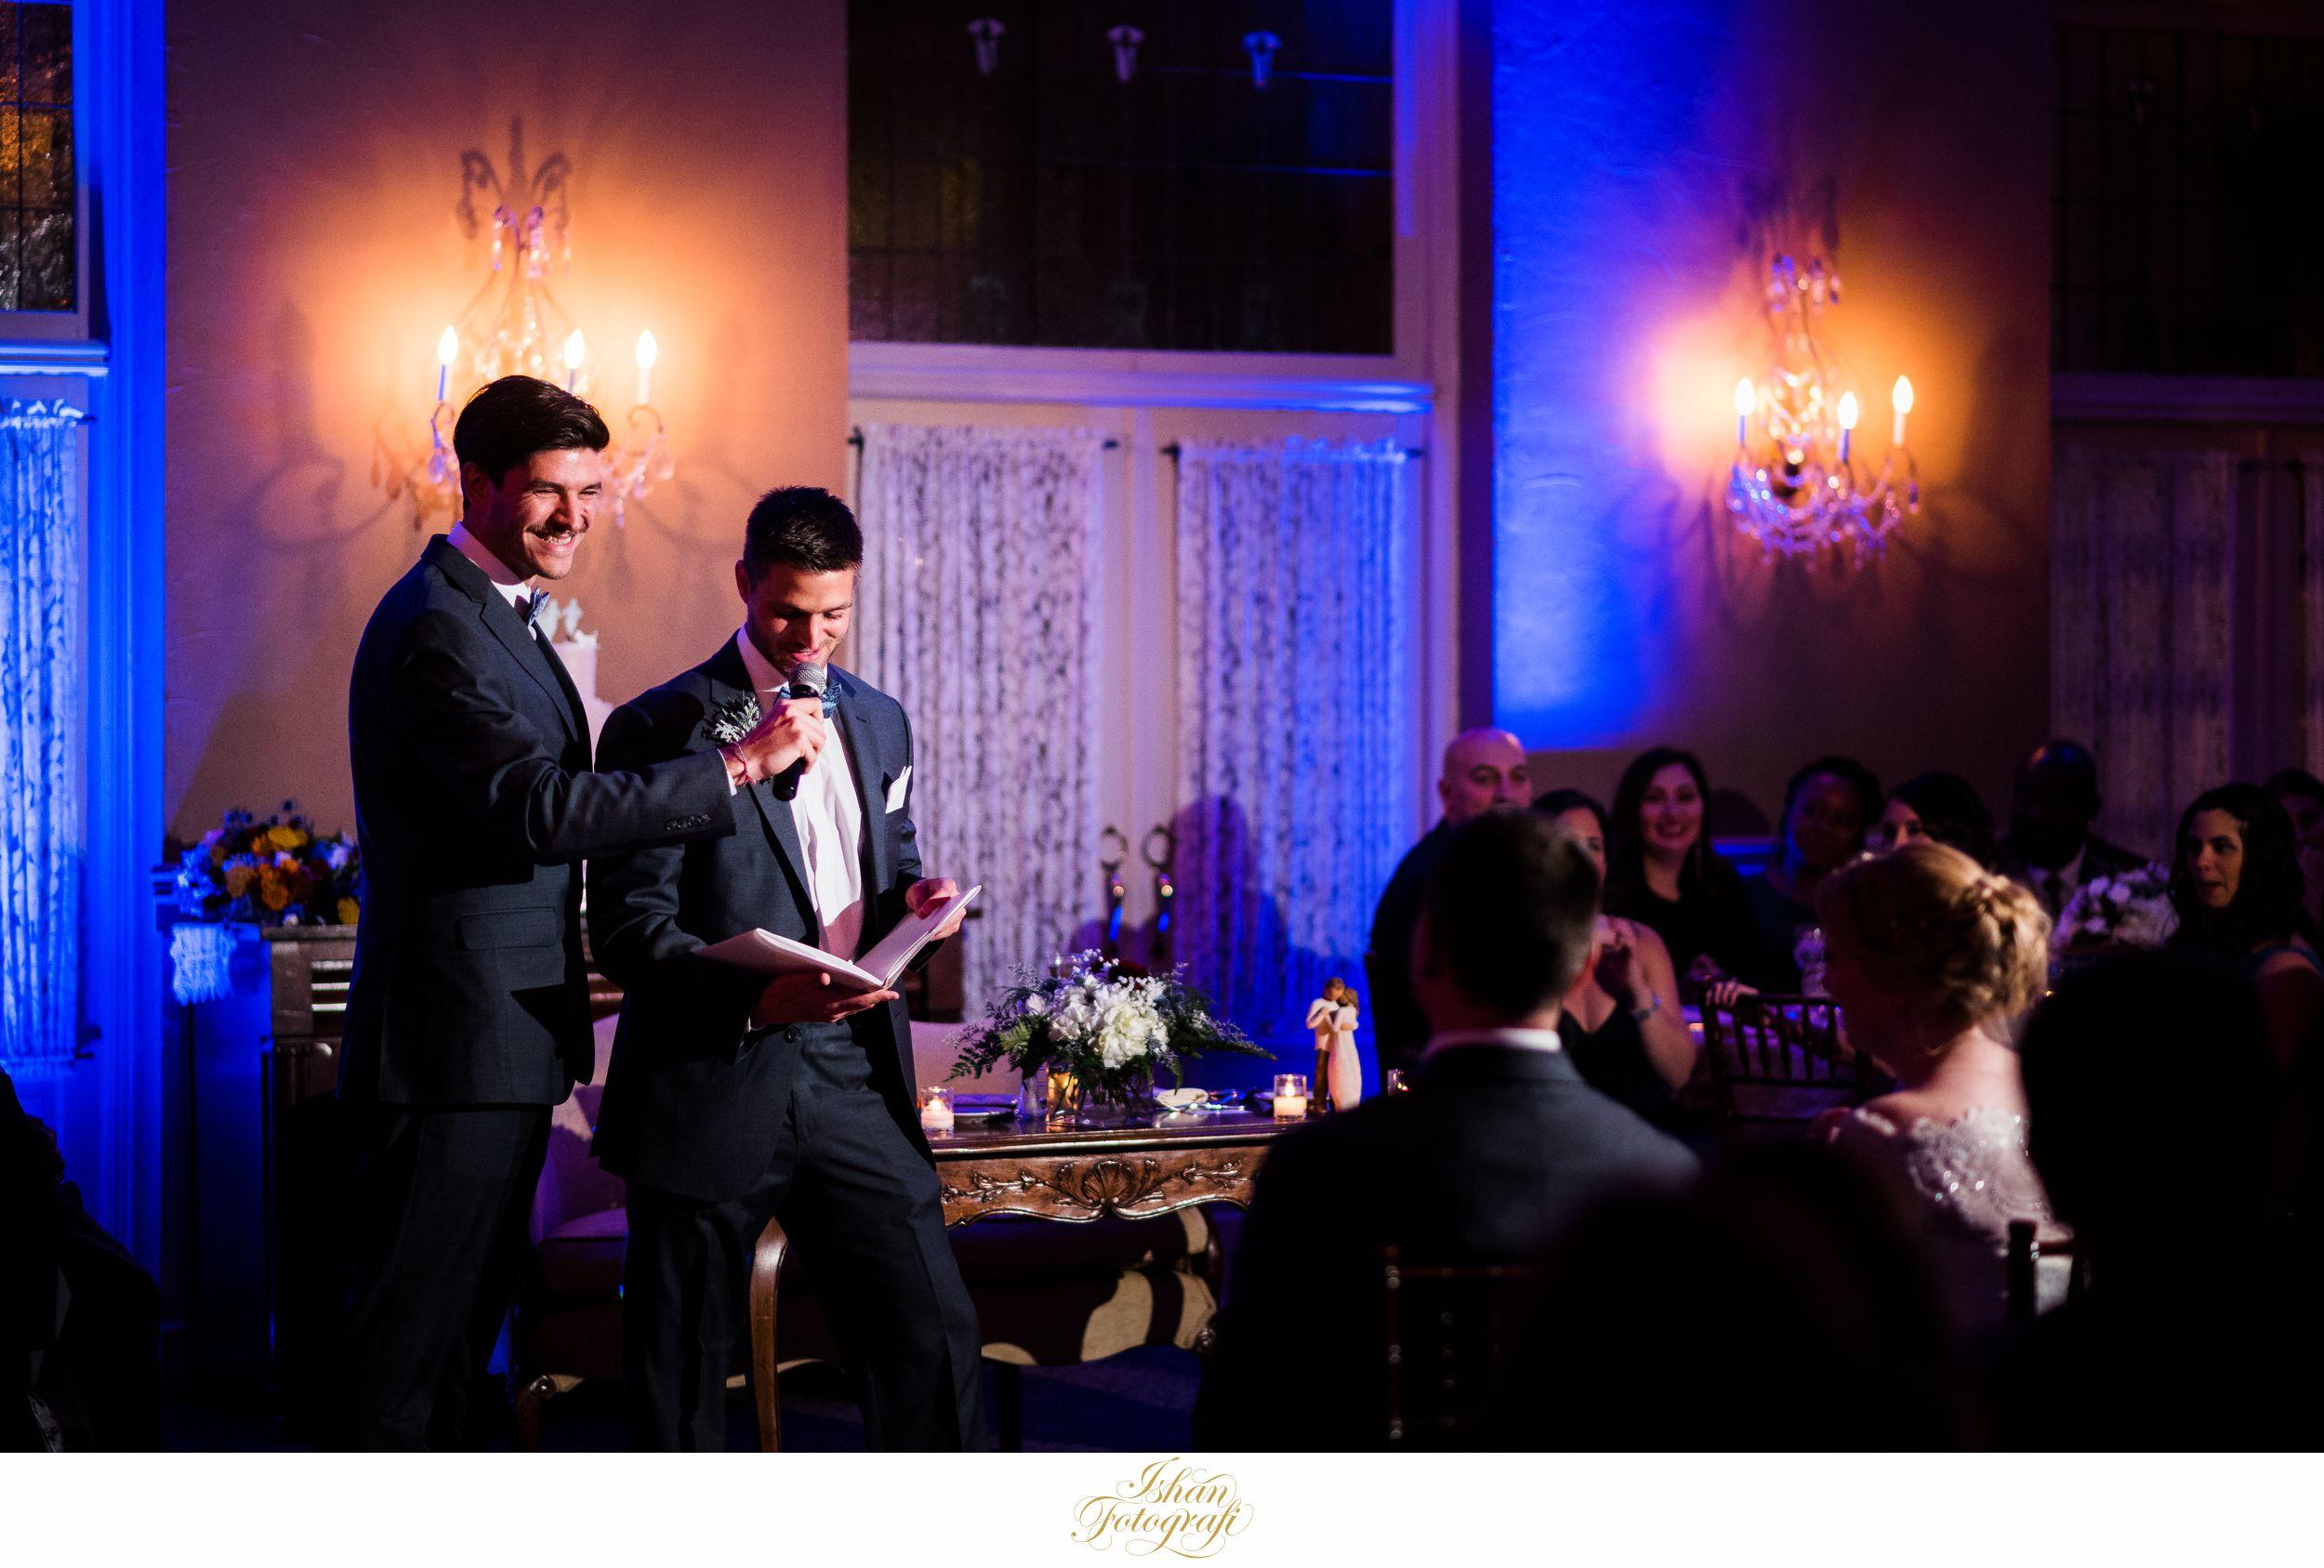 wedding-reception-photos-davids-country-inn-new-jersey